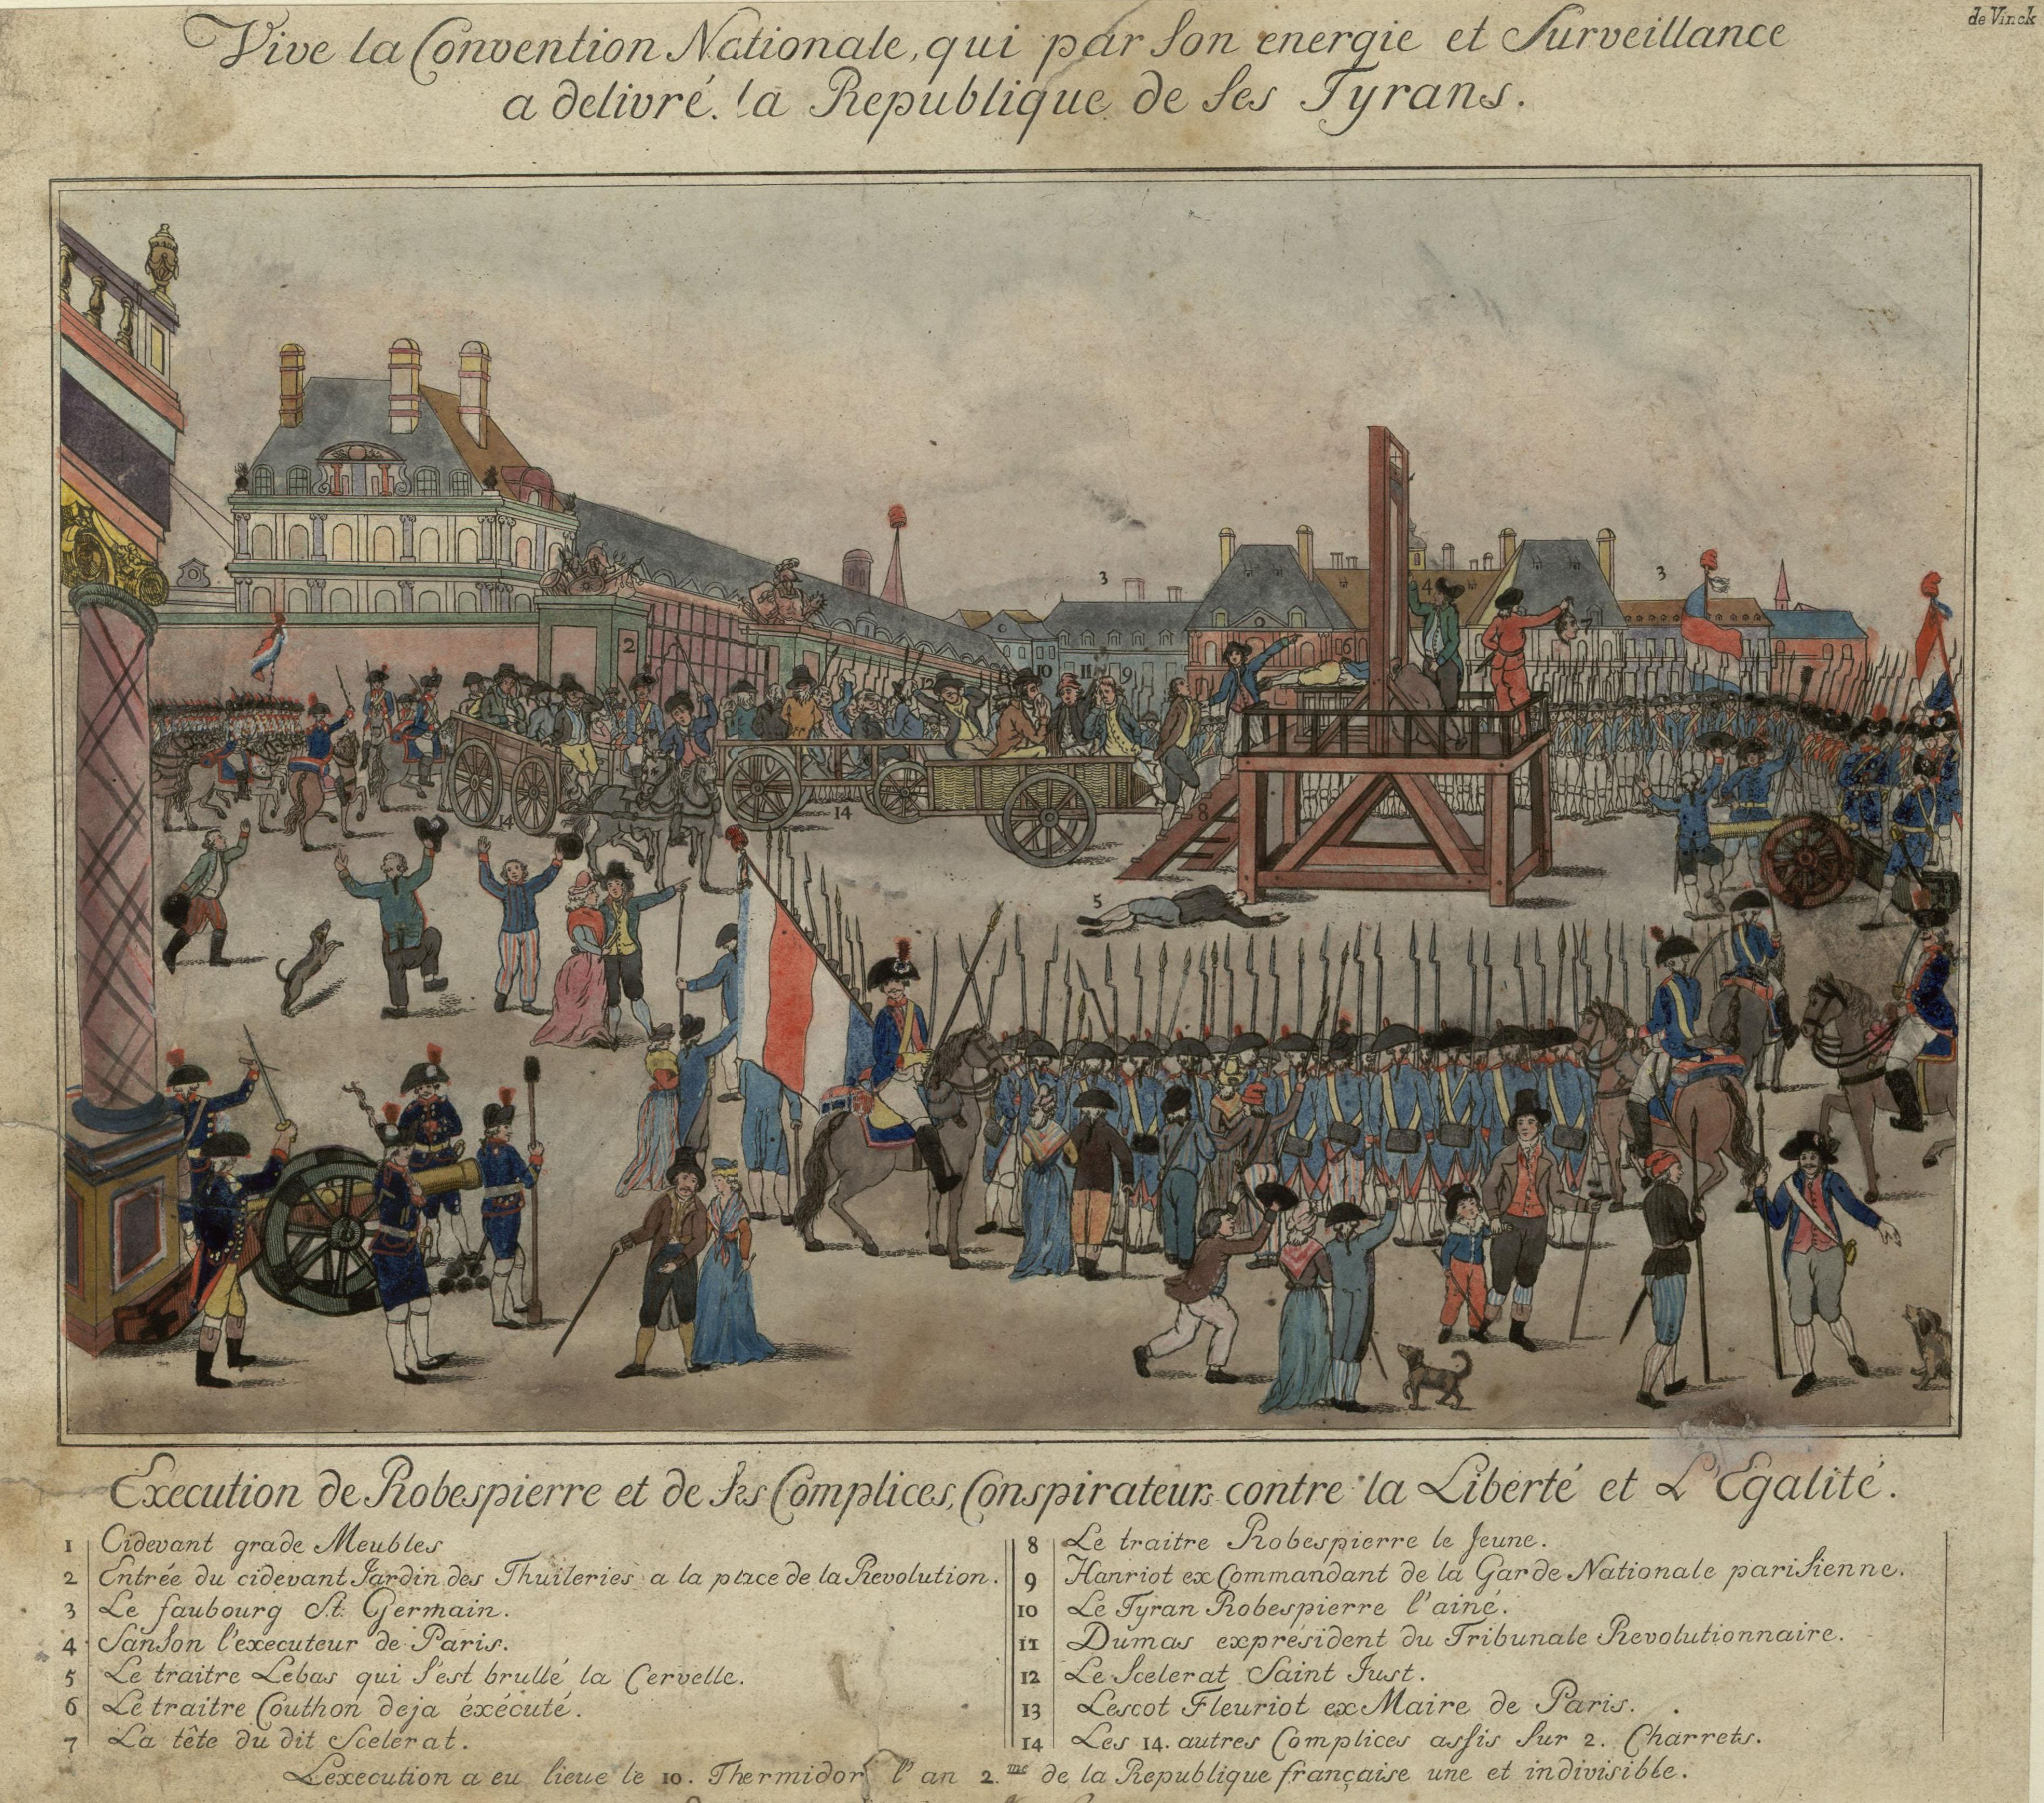 http://ekladata.com/dM2HaefQw_WvO8gLgVYGPDgPwYU/3-Robespierre-execution-1794.jpg